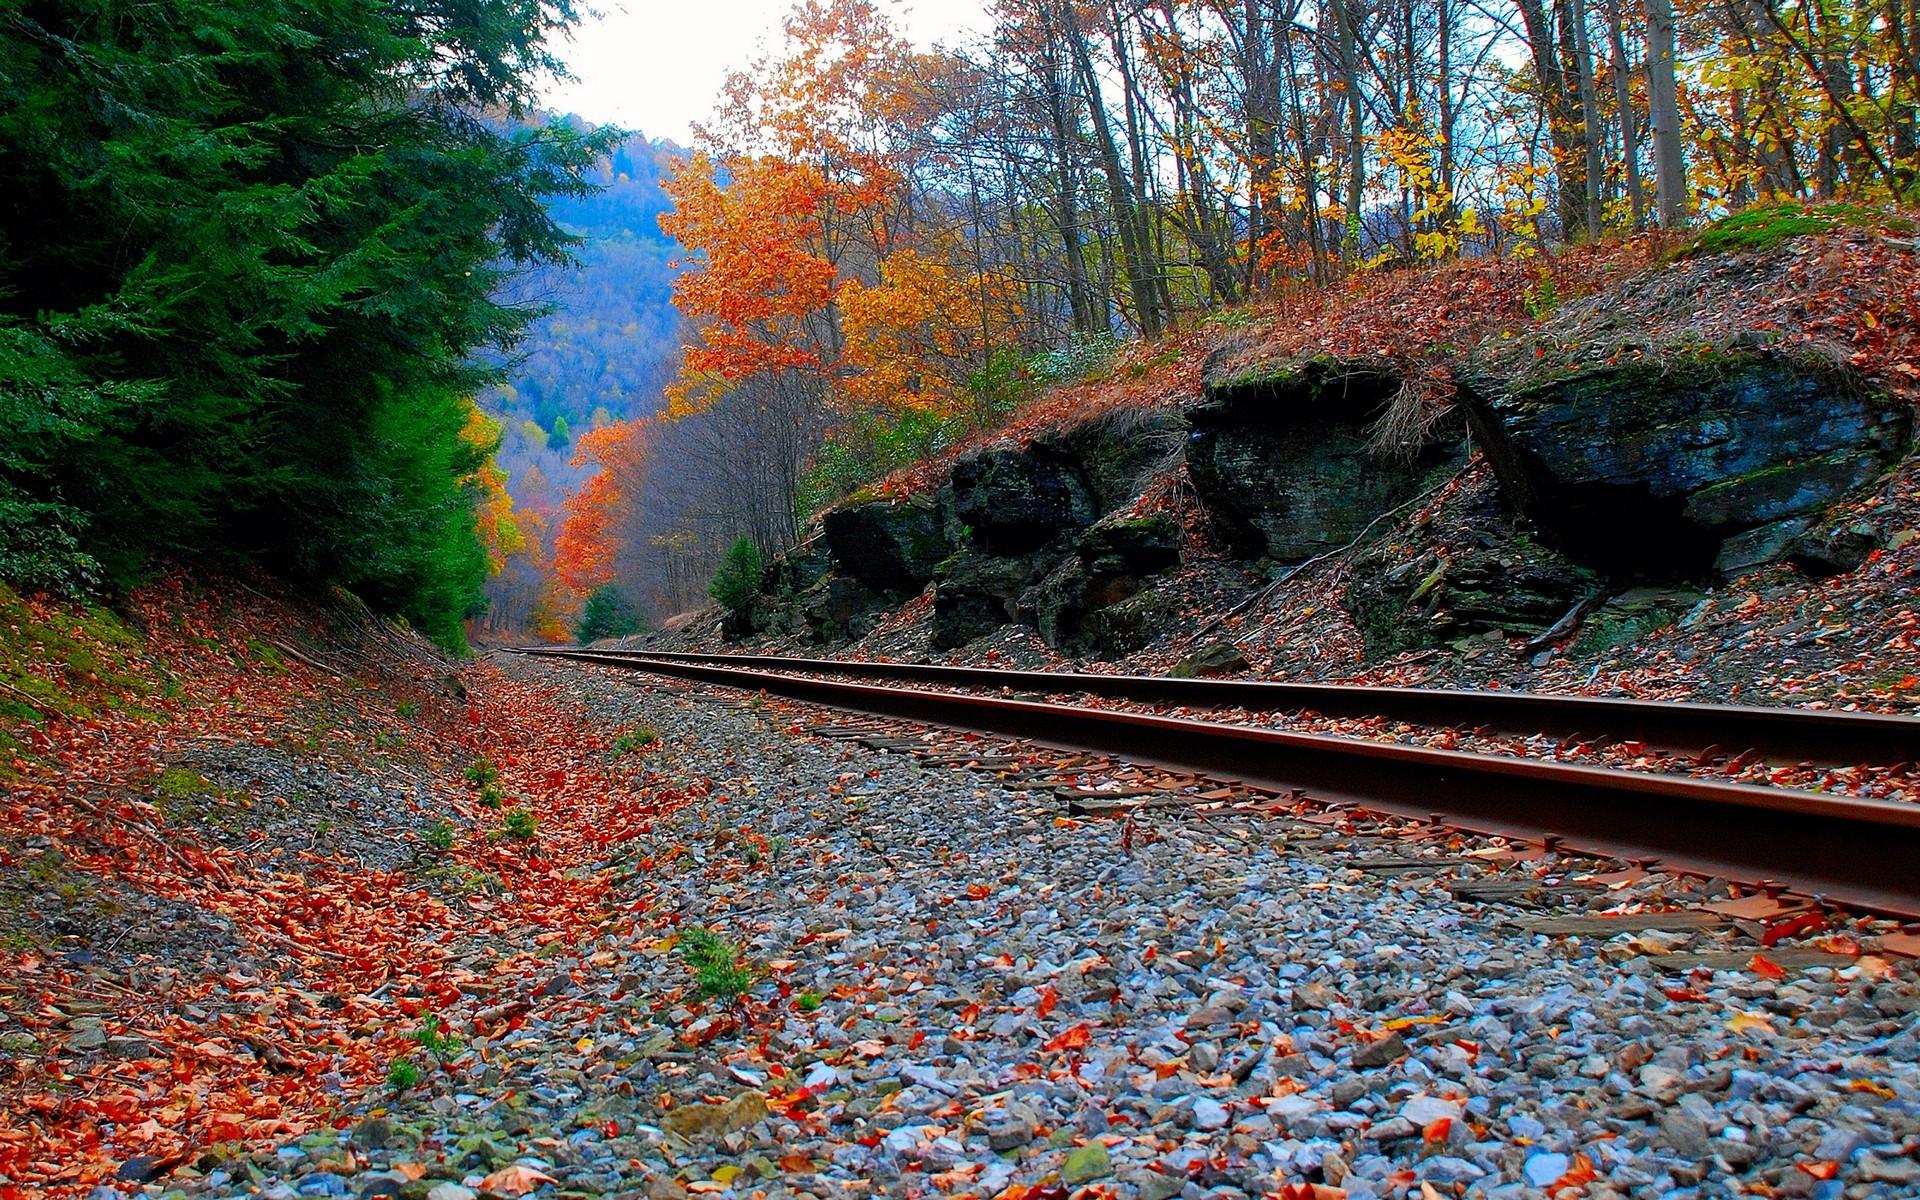 Wallpaper forest, autumn, rails, railroad, Railway in autumn forest.